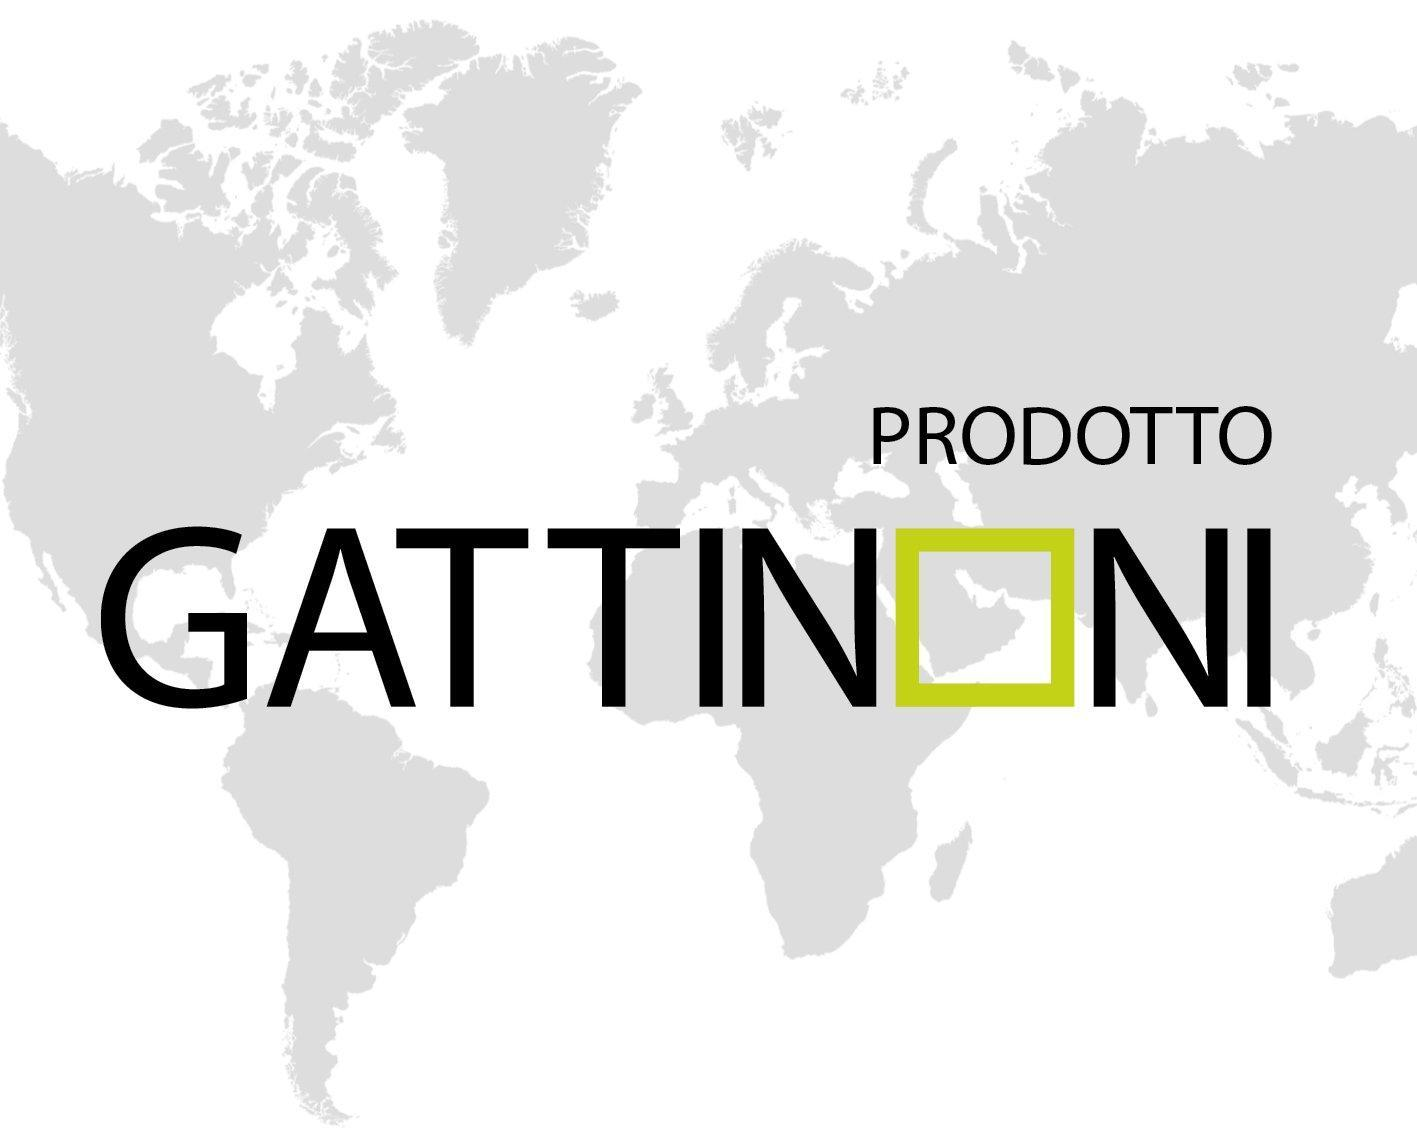 QC Terme Grand Hotel Bagni Nuovi Lombardia - GATTINONI,